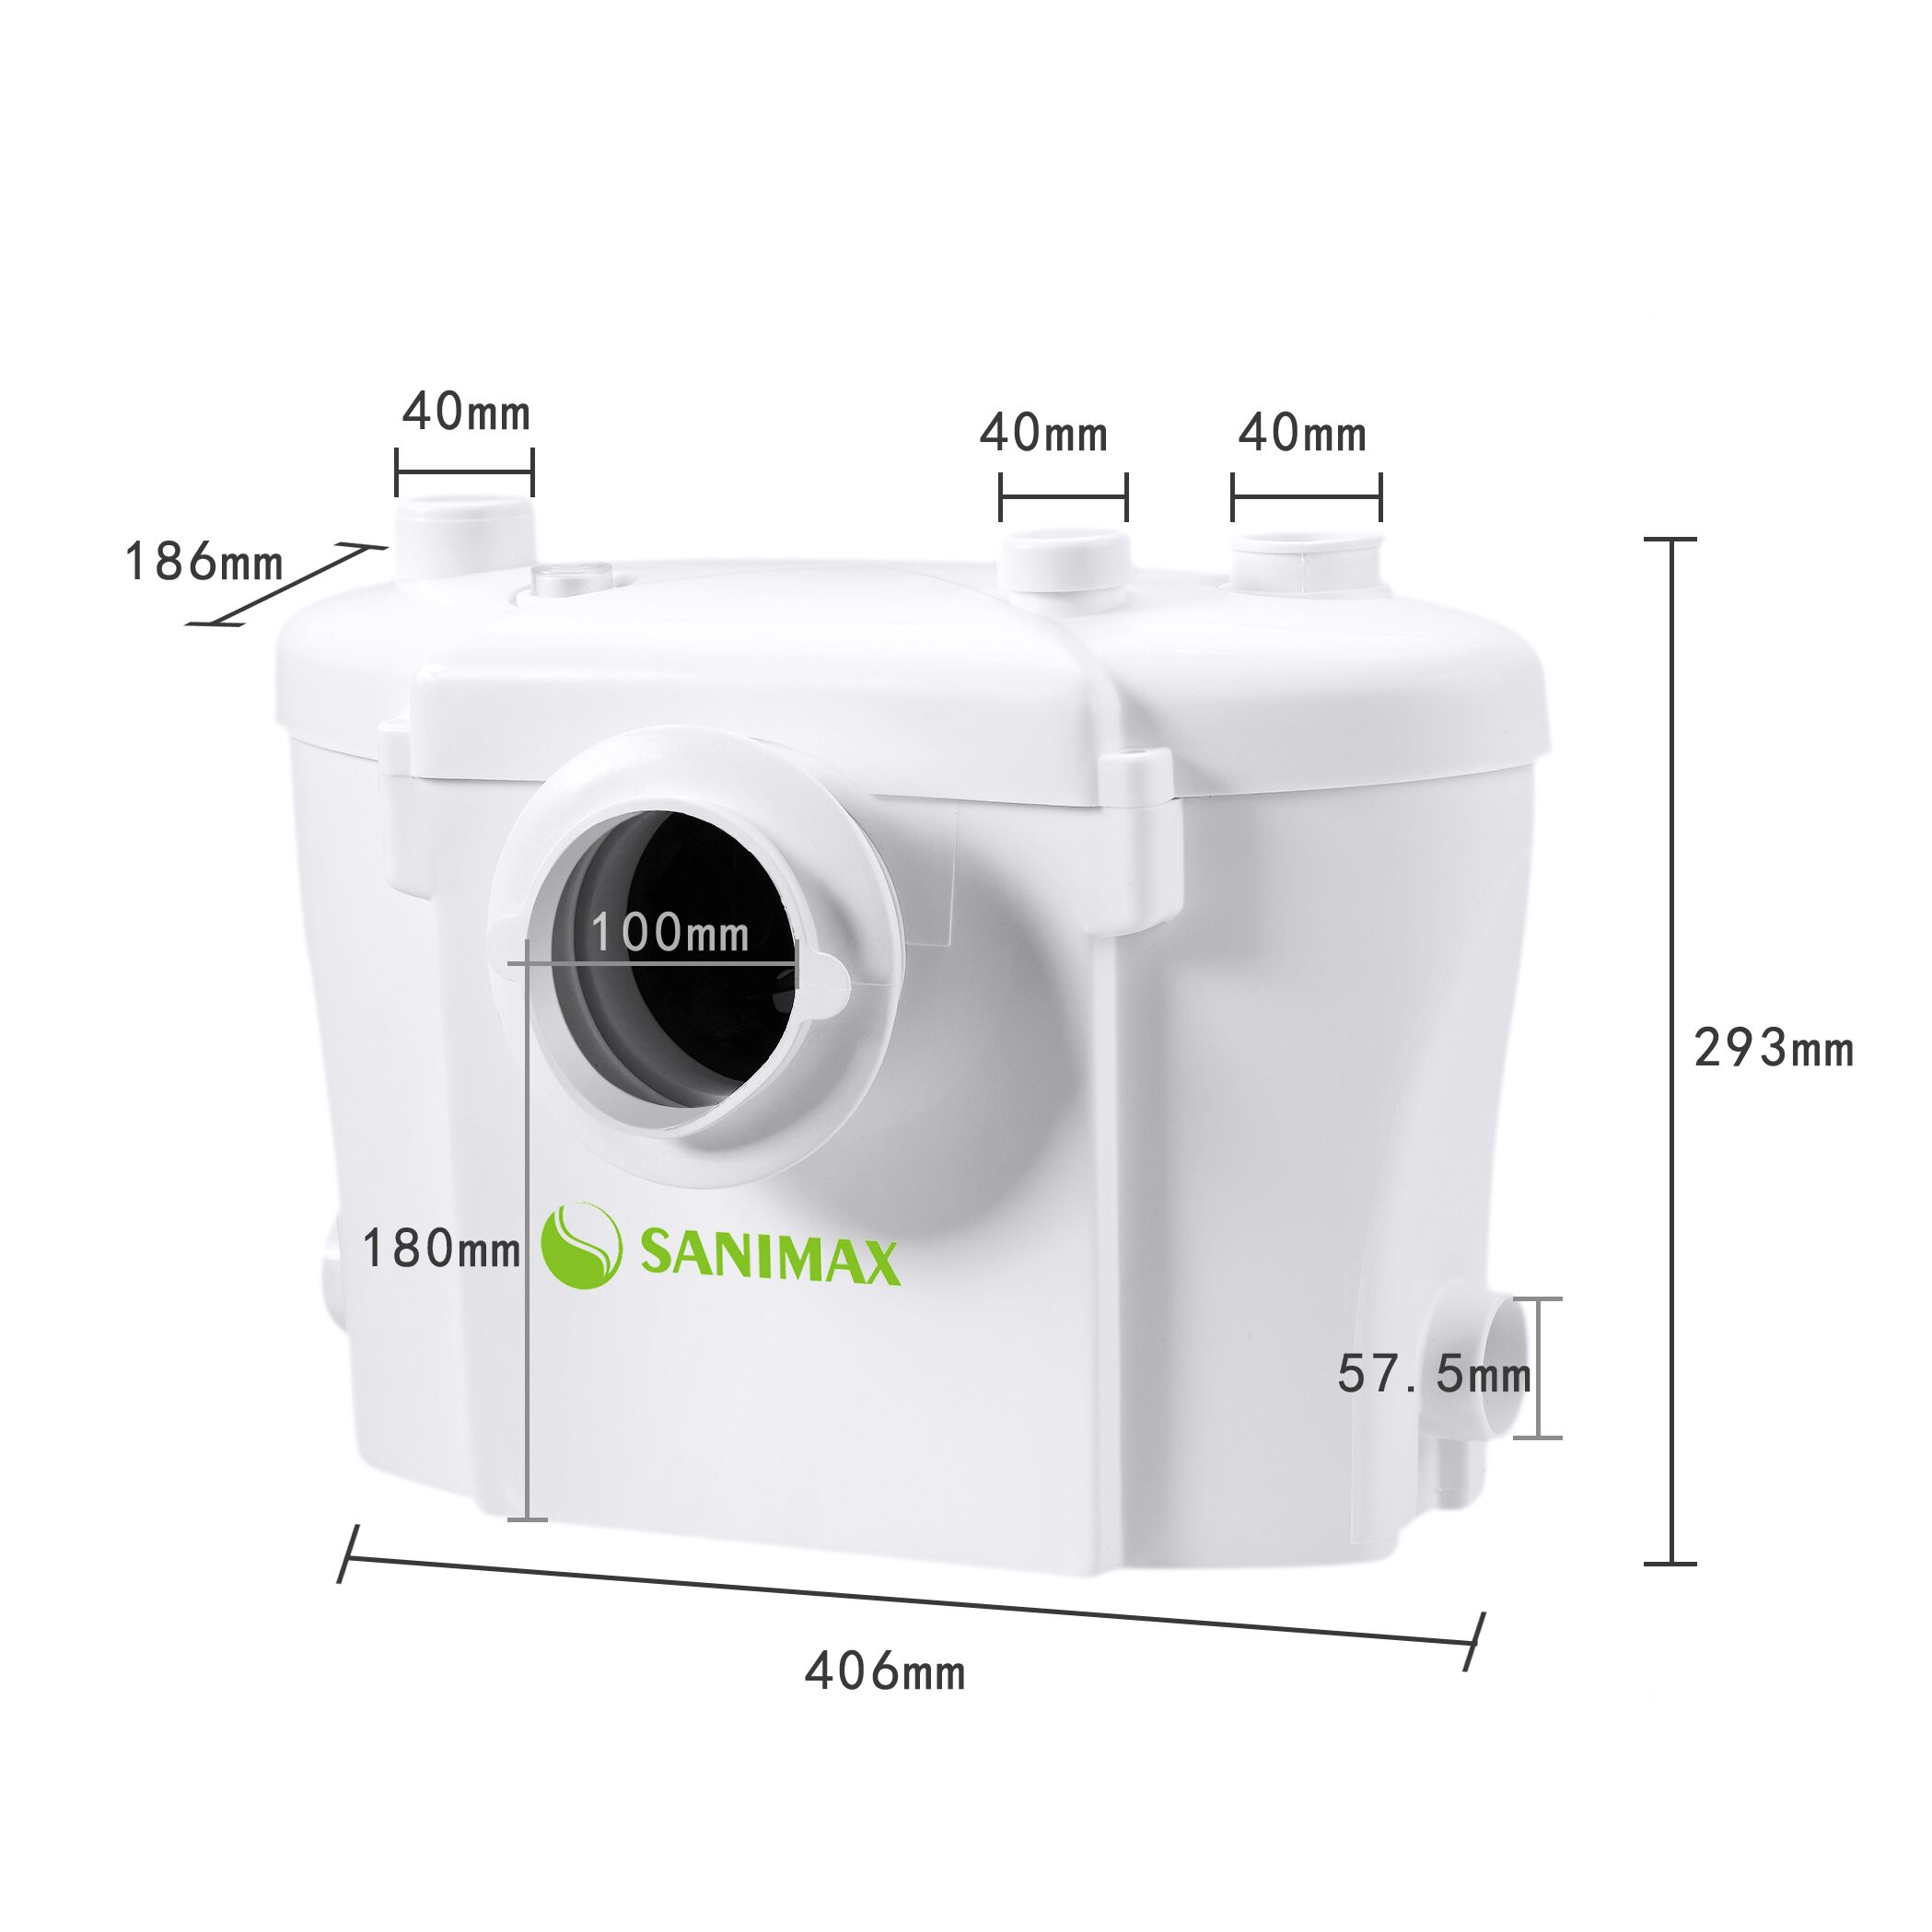 broyeur pour sanimax wc broyeur sanitaire 400w silencieux. Black Bedroom Furniture Sets. Home Design Ideas